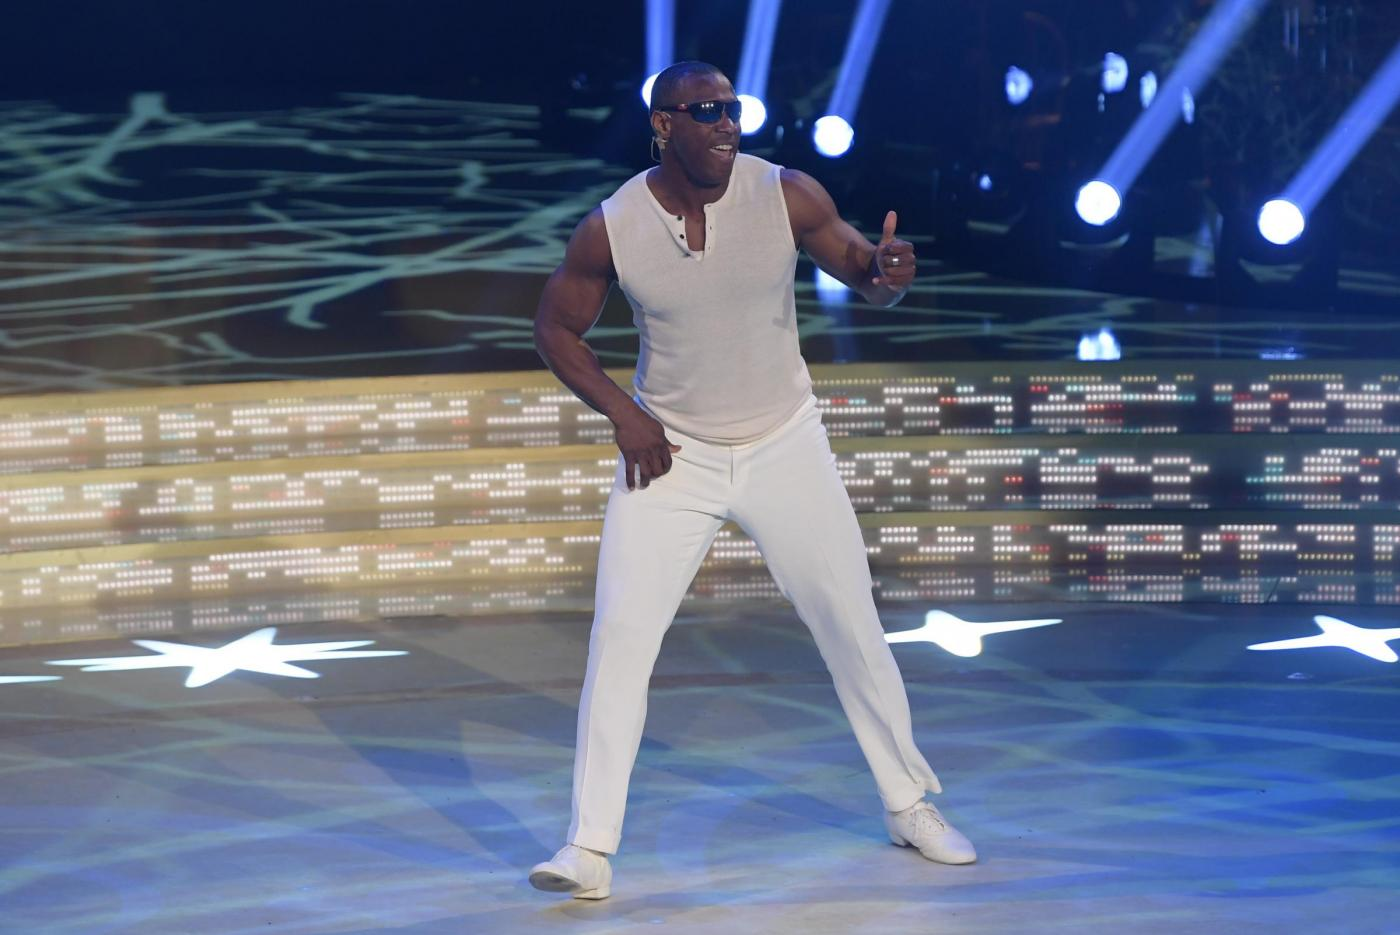 Oney Tapia Ballando con le stelle